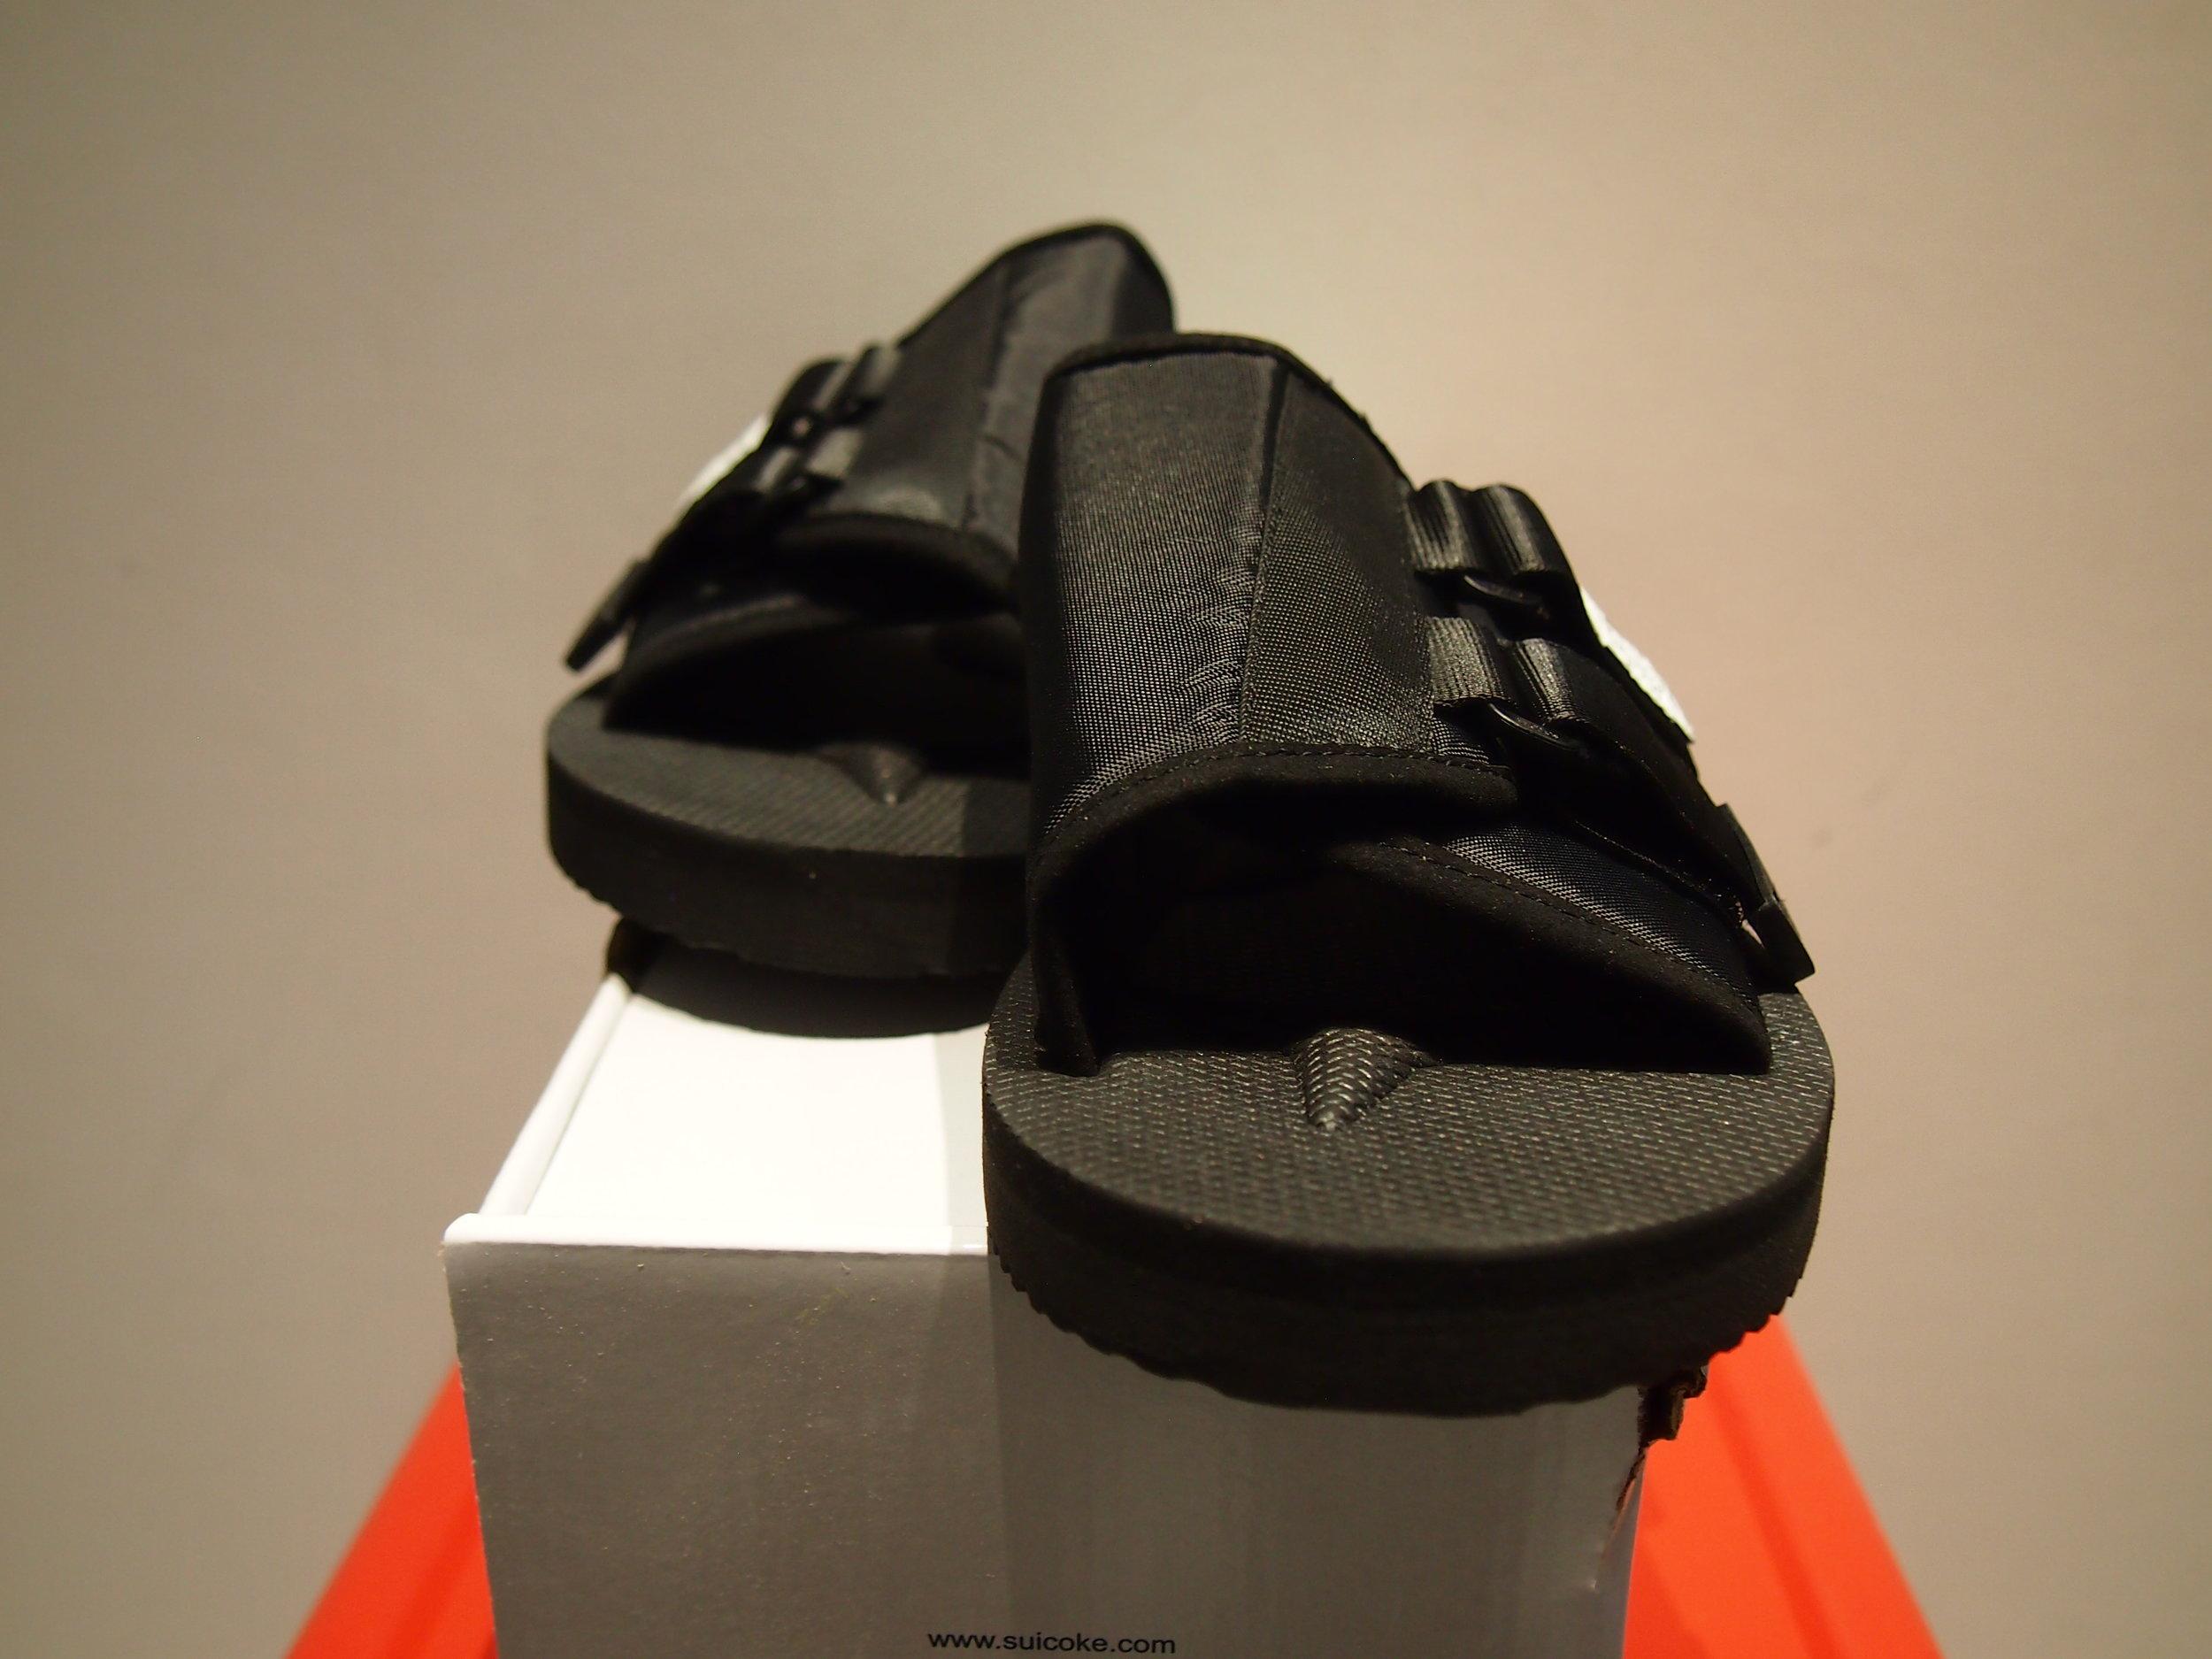 7e8c5edbcd8b Suicoke KAW-CAB Slide Sandal MEN — global atomic designs inc